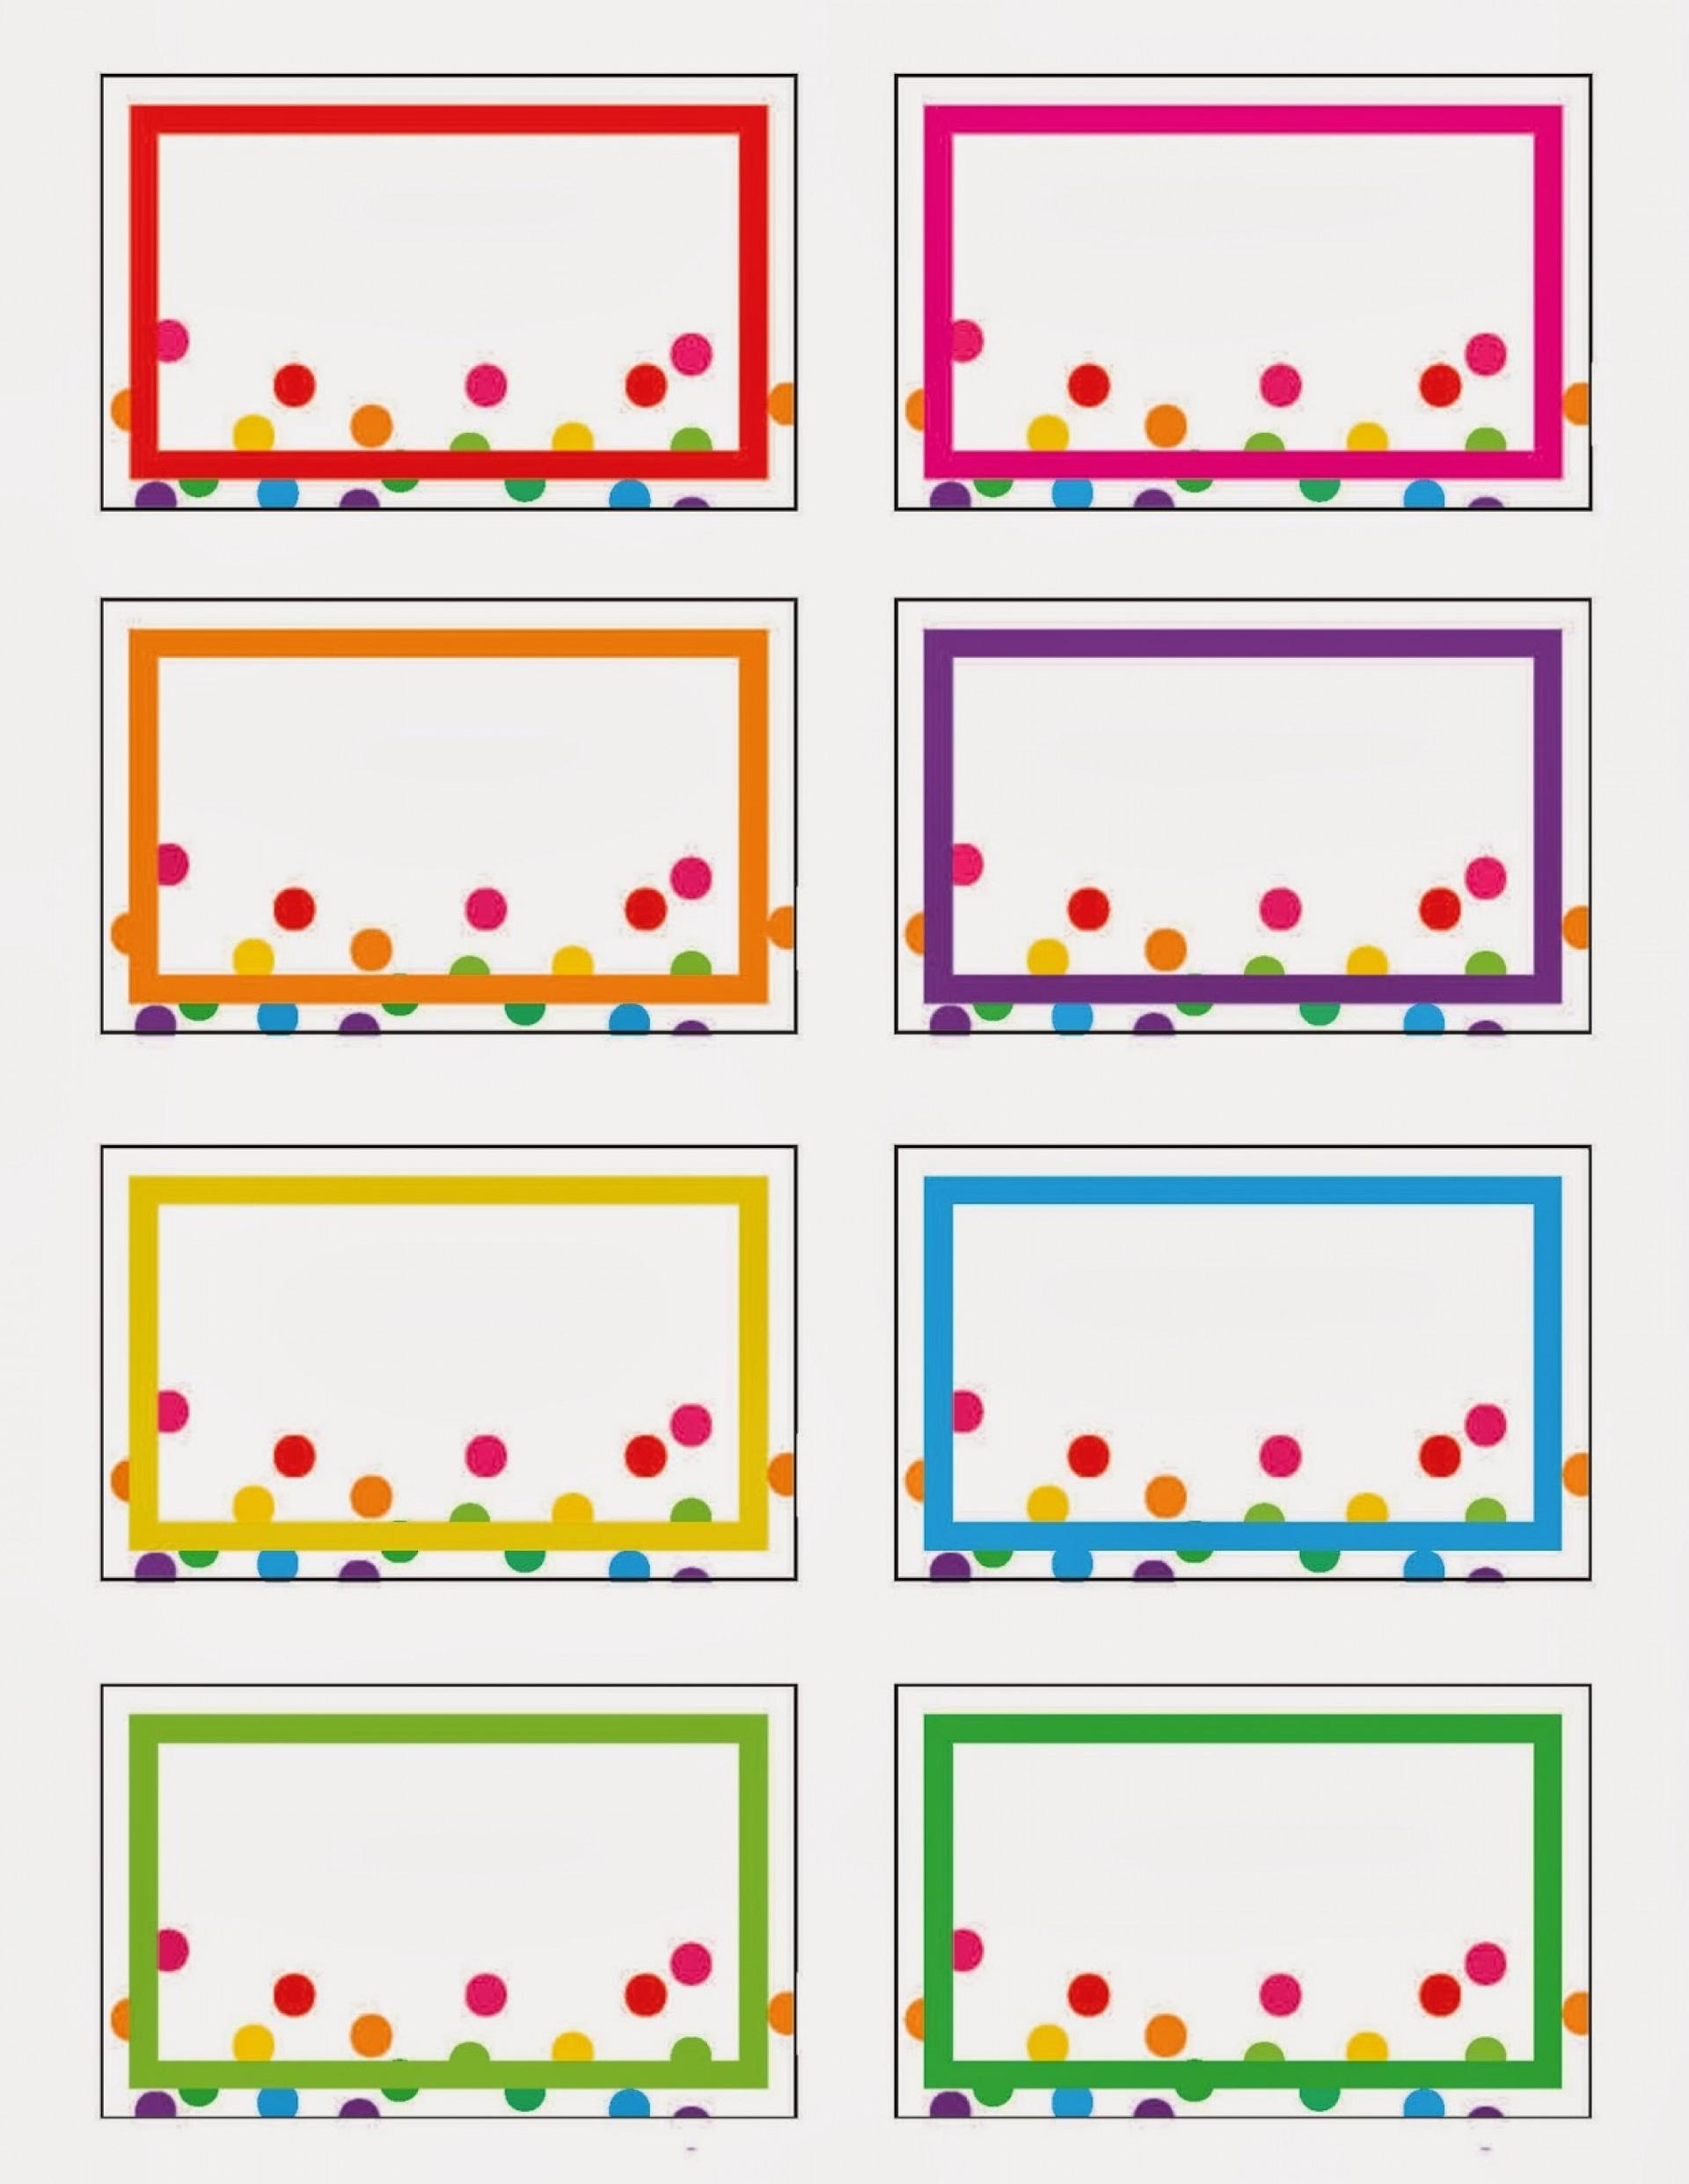 023 Printable Name Tags Free Badge Template ~ Ulyssesroom - Free Printable Name Tags For Preschoolers